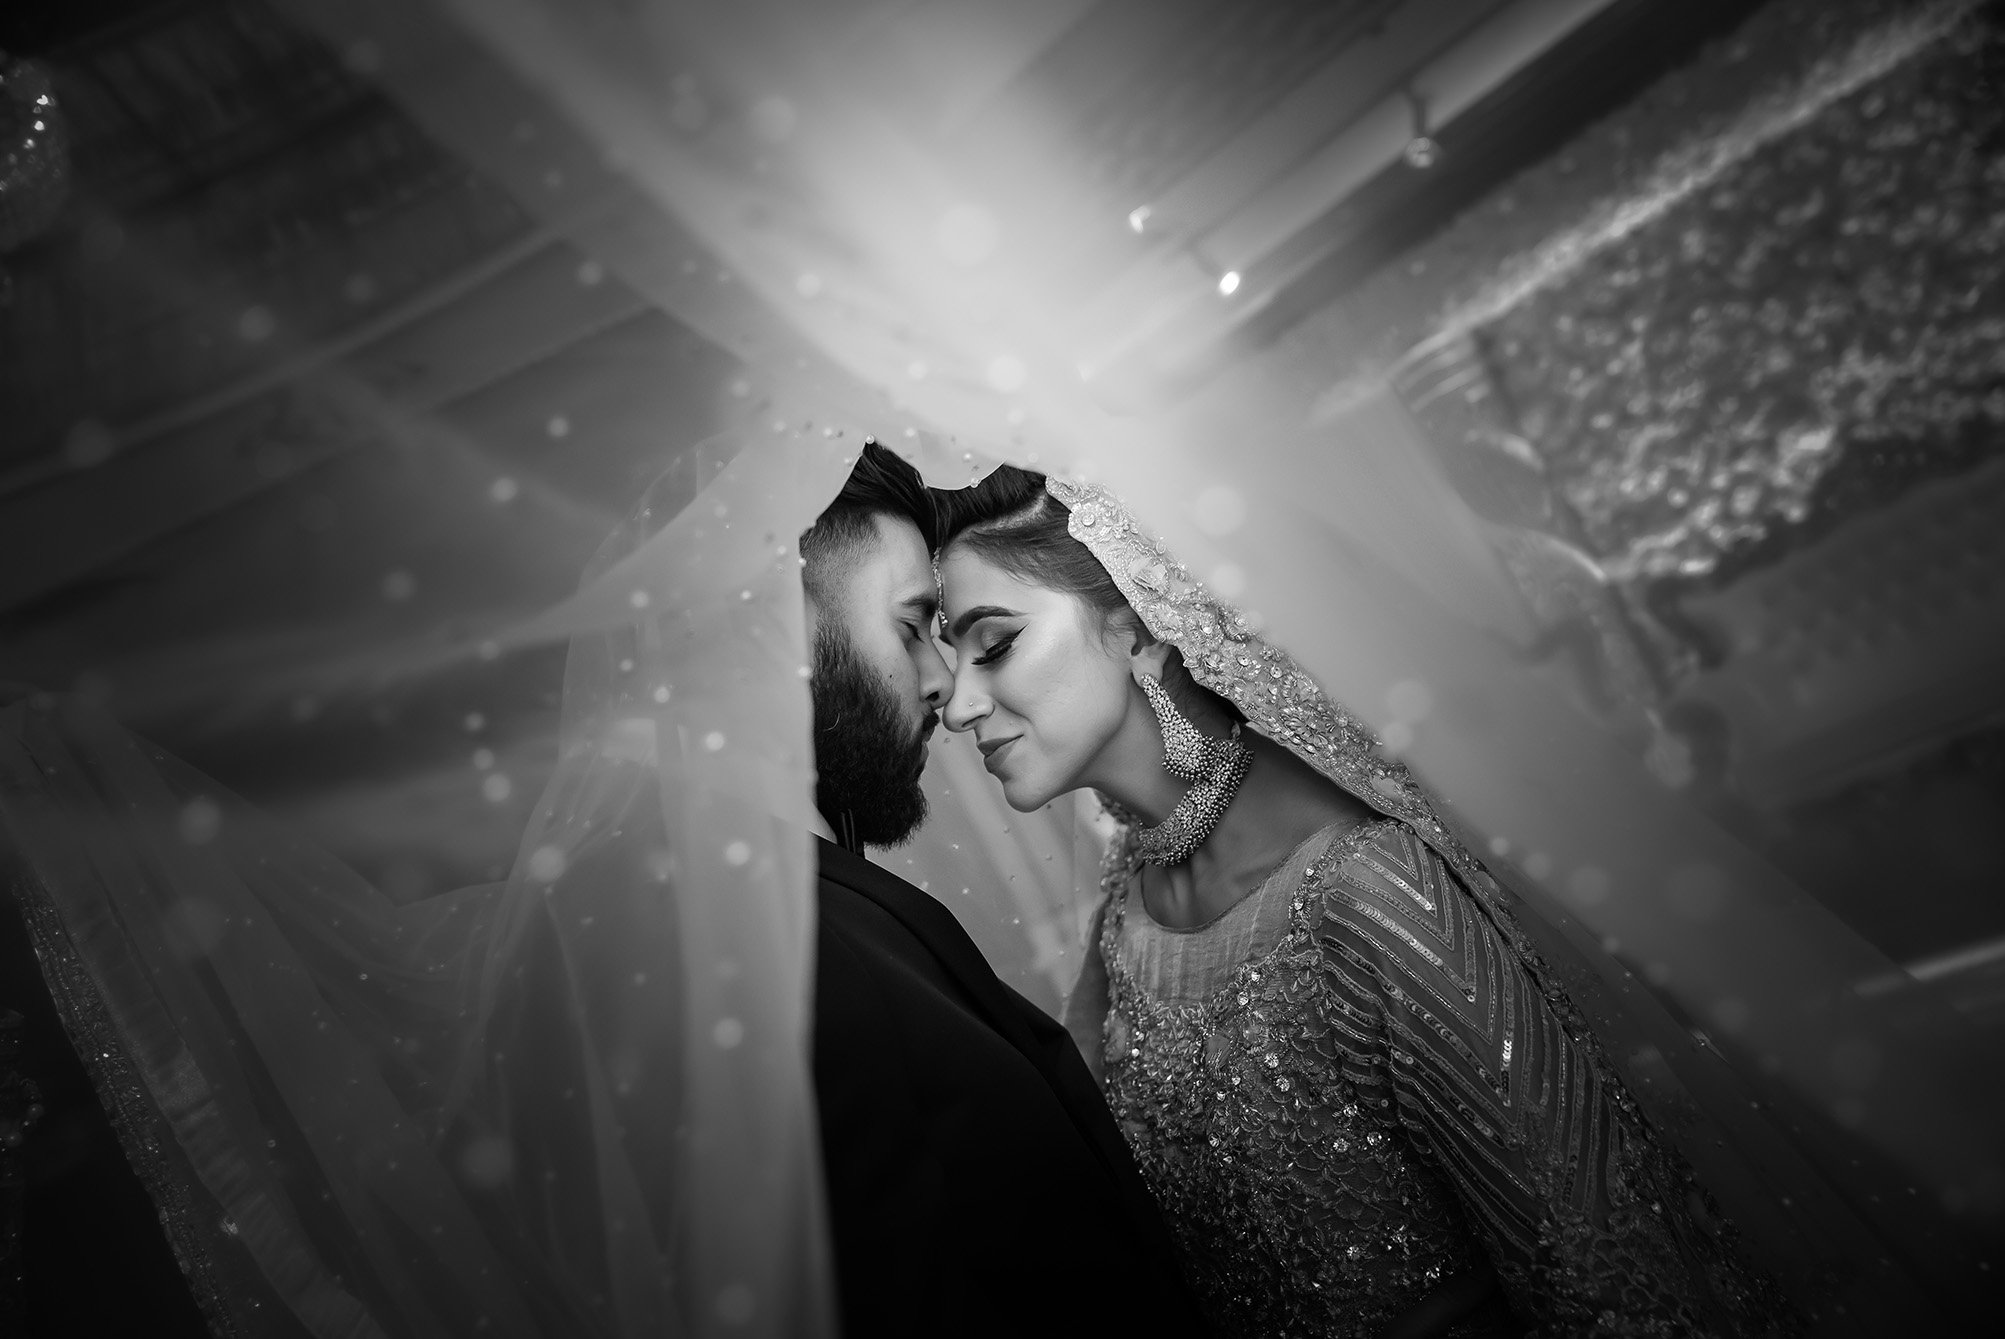 Leonards-Palazzo-Pakistani-Wedding-Photography South Asian Weddings